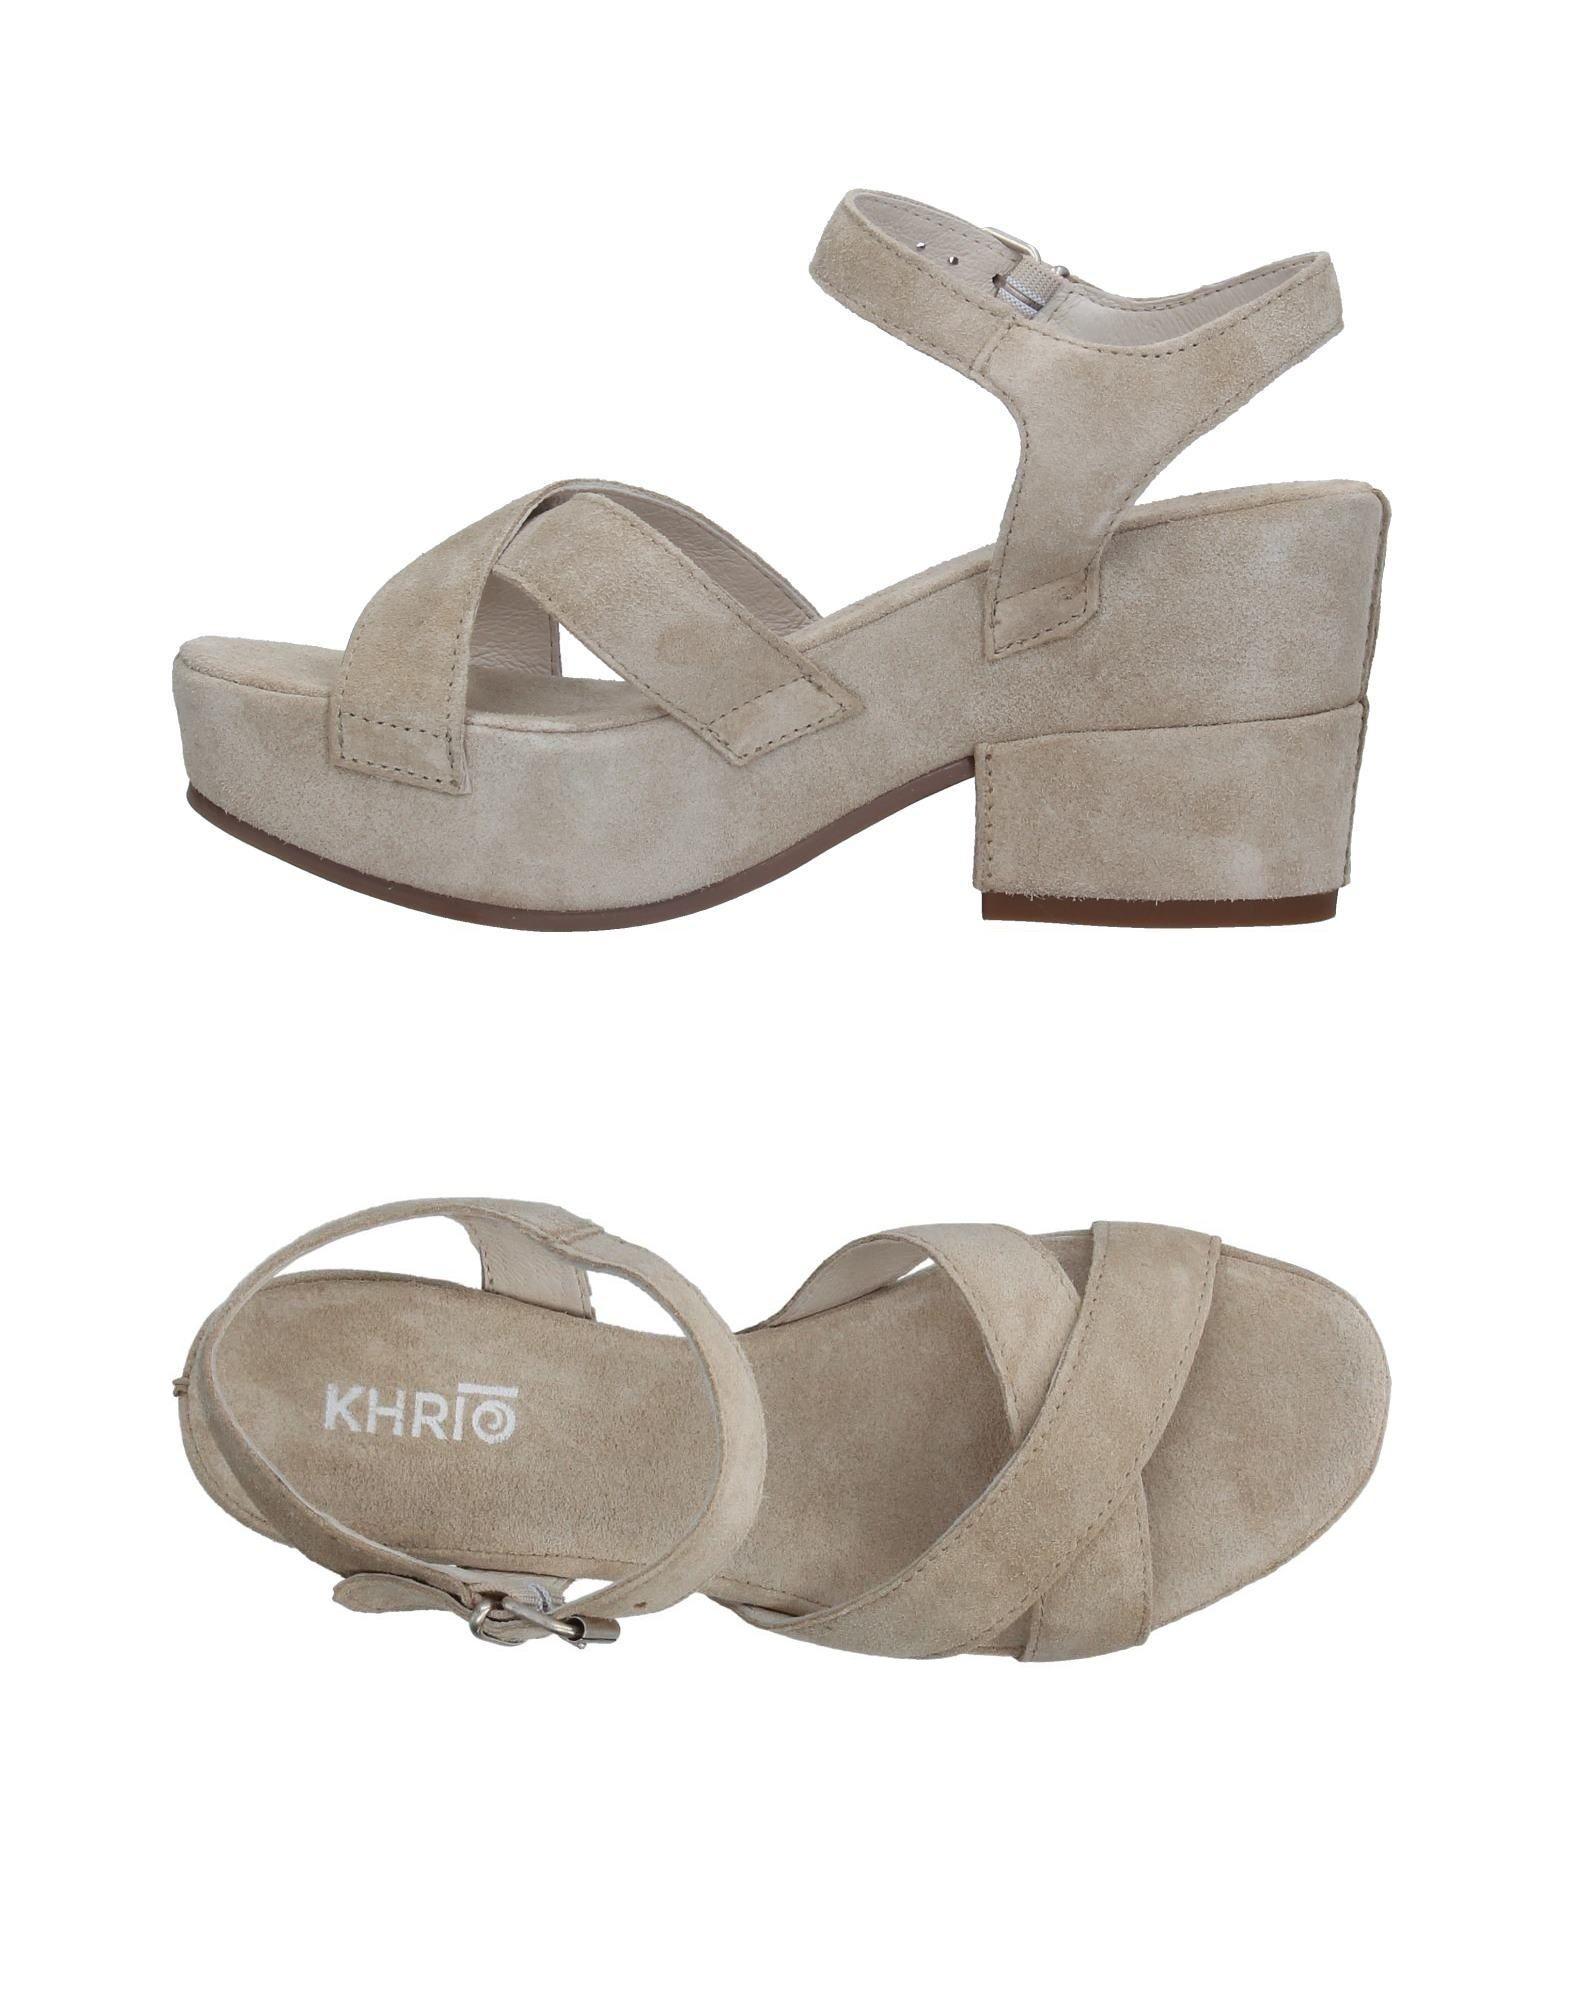 Khrio' Sandalen Damen  11326983MU Gute Qualität beliebte Schuhe